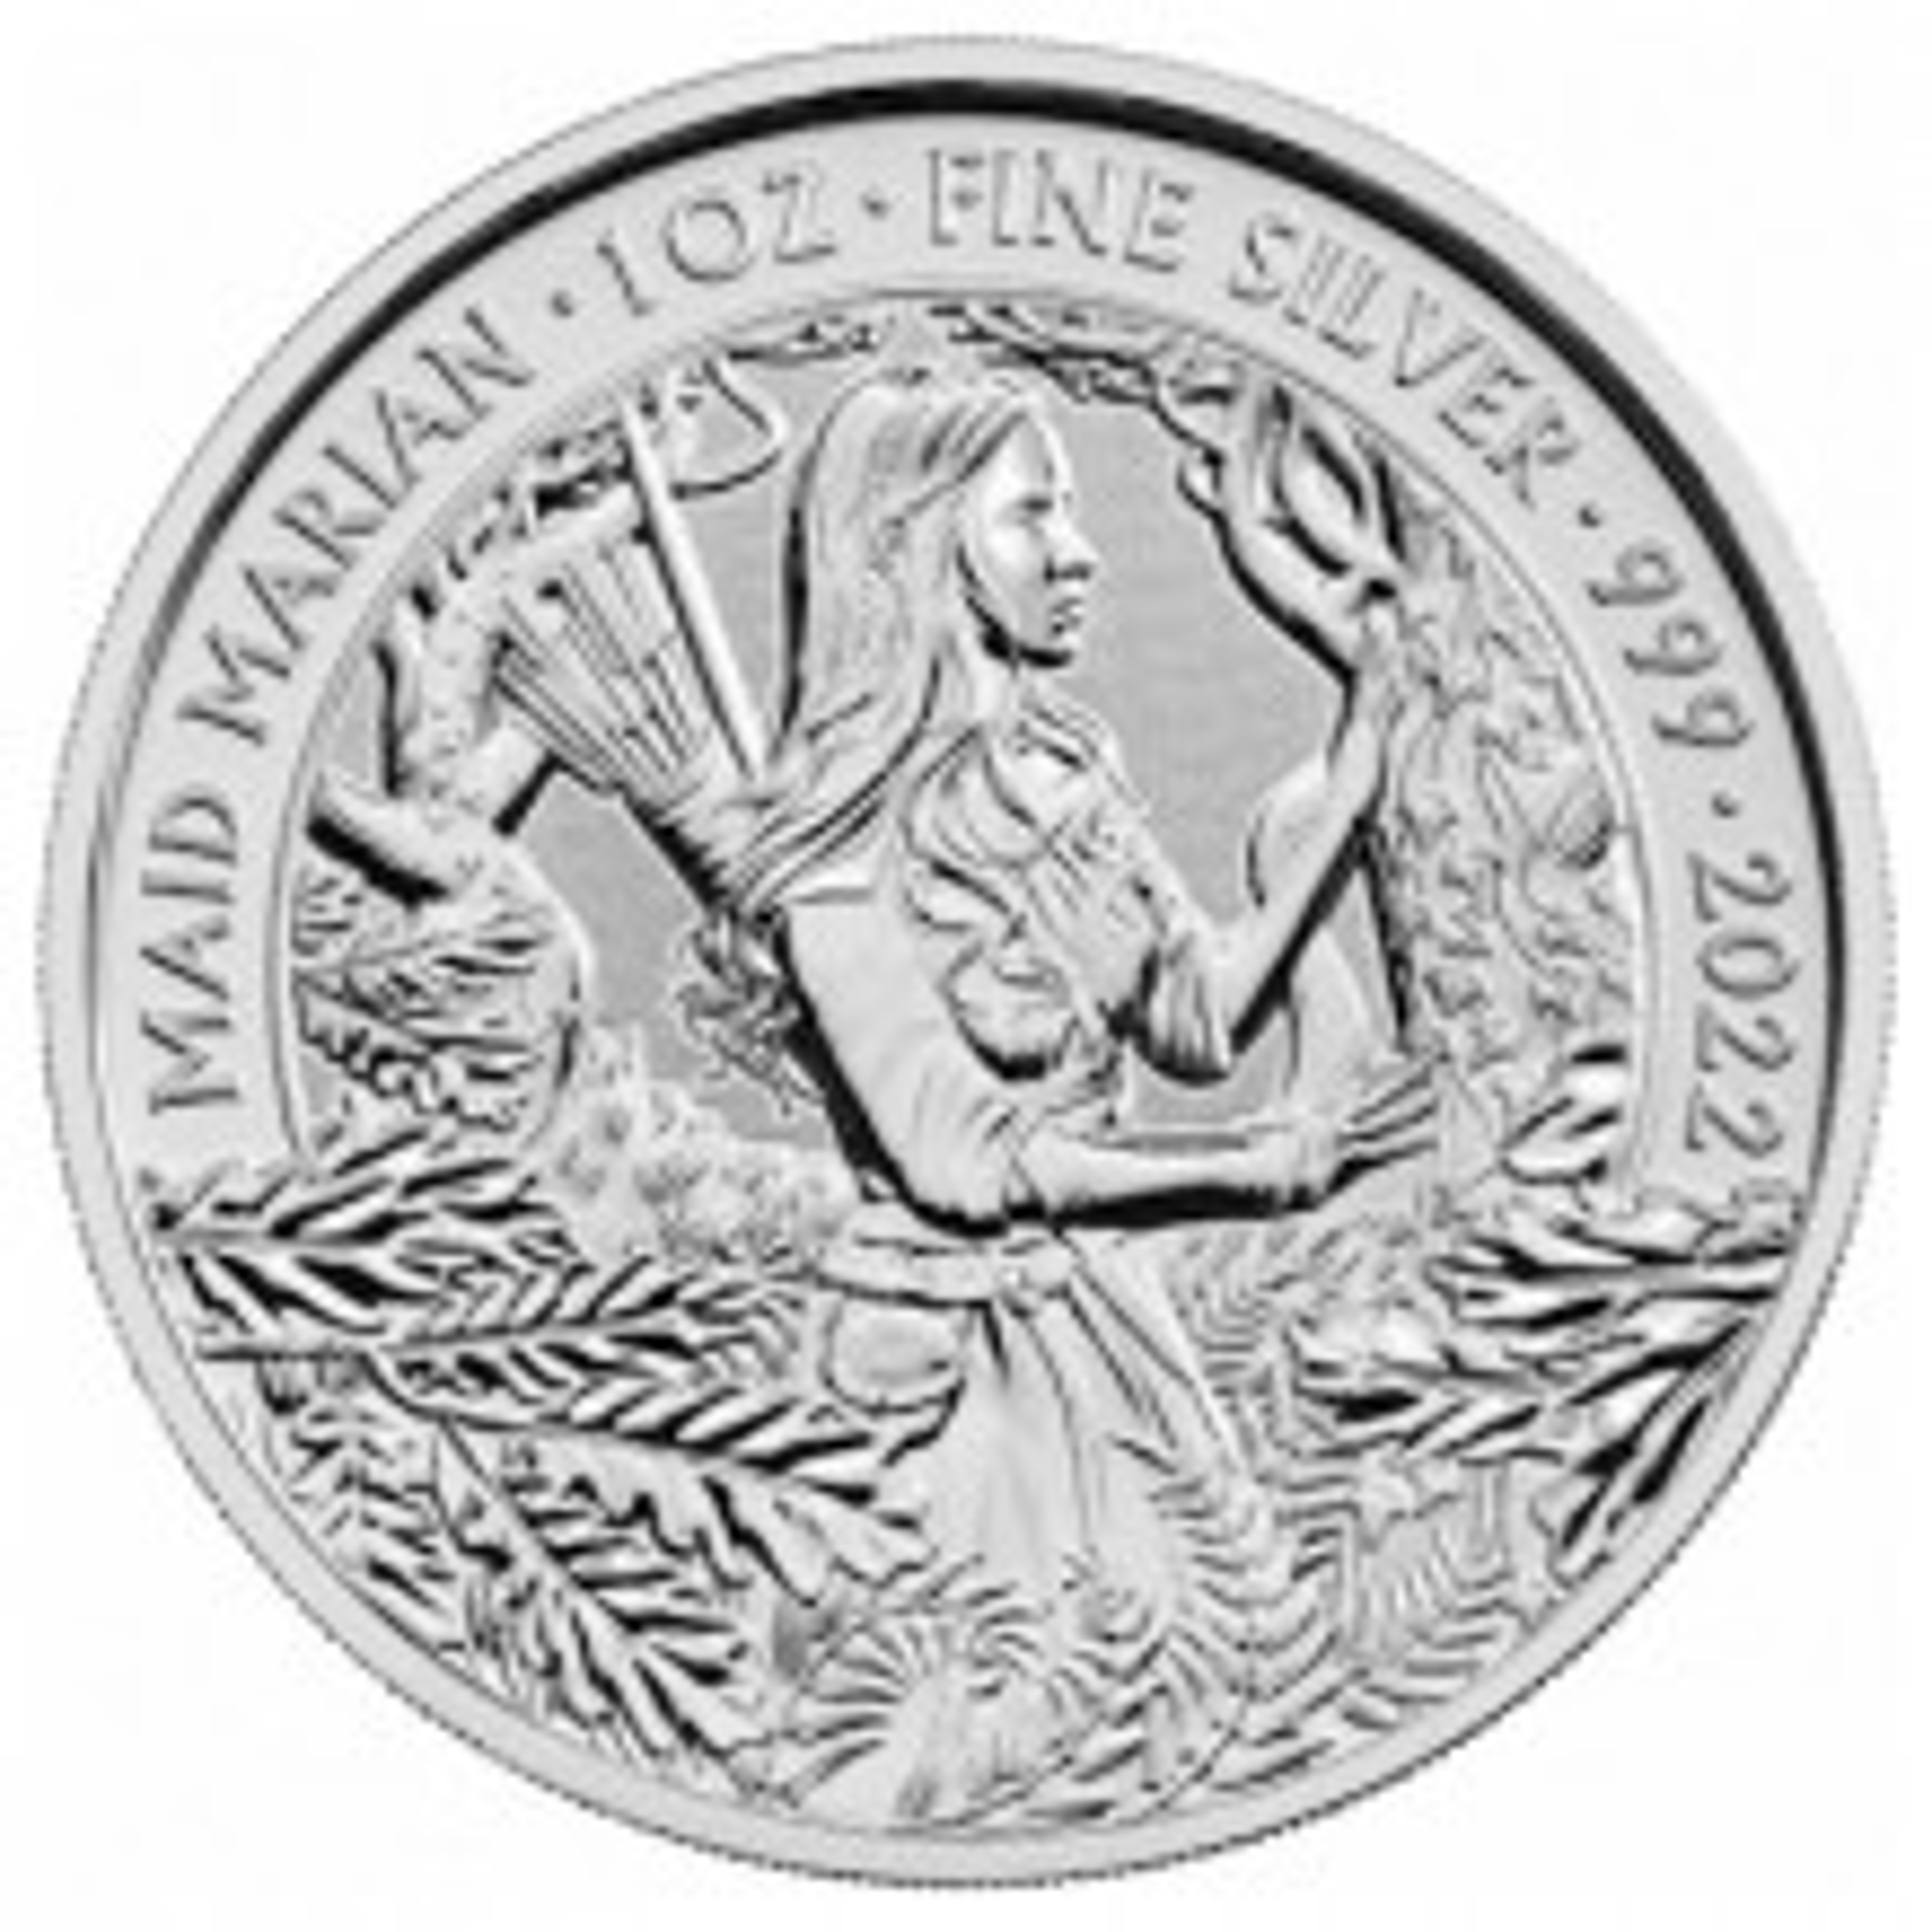 1 troy ounce zilveren munt Maid Marian 2022